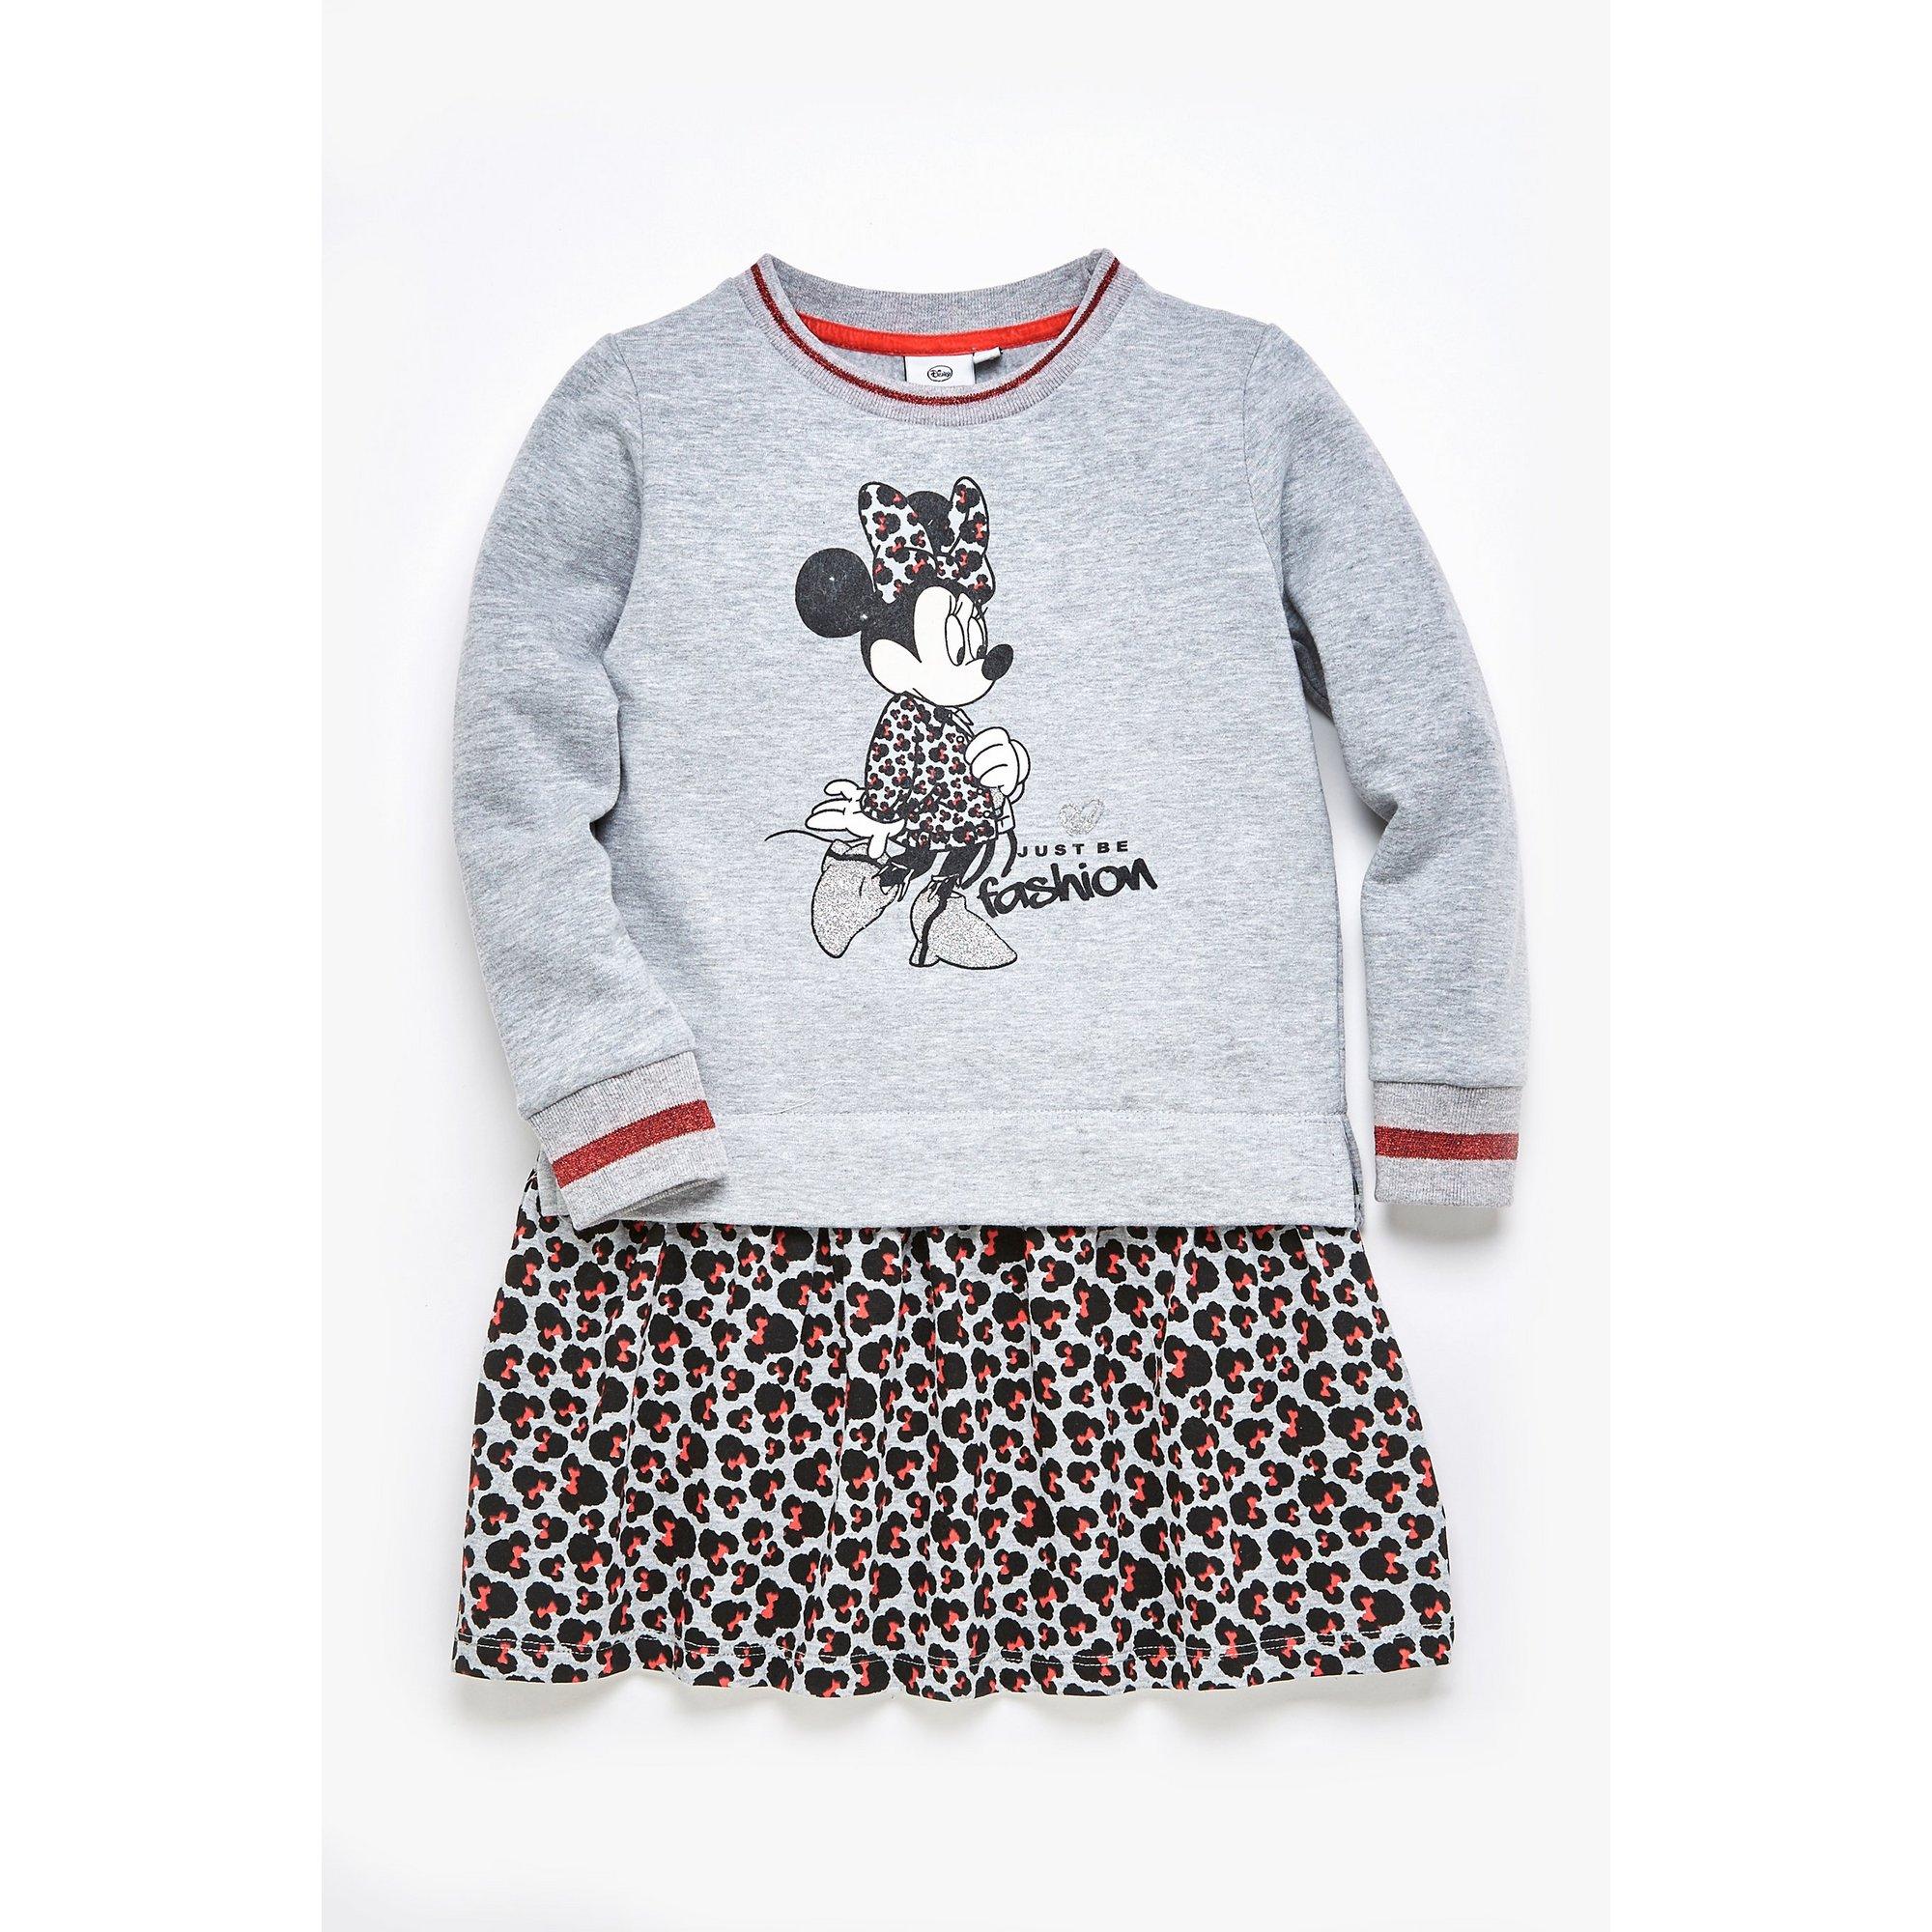 Image of Girls Minnie Mouse Grey Leopard Sweatdress